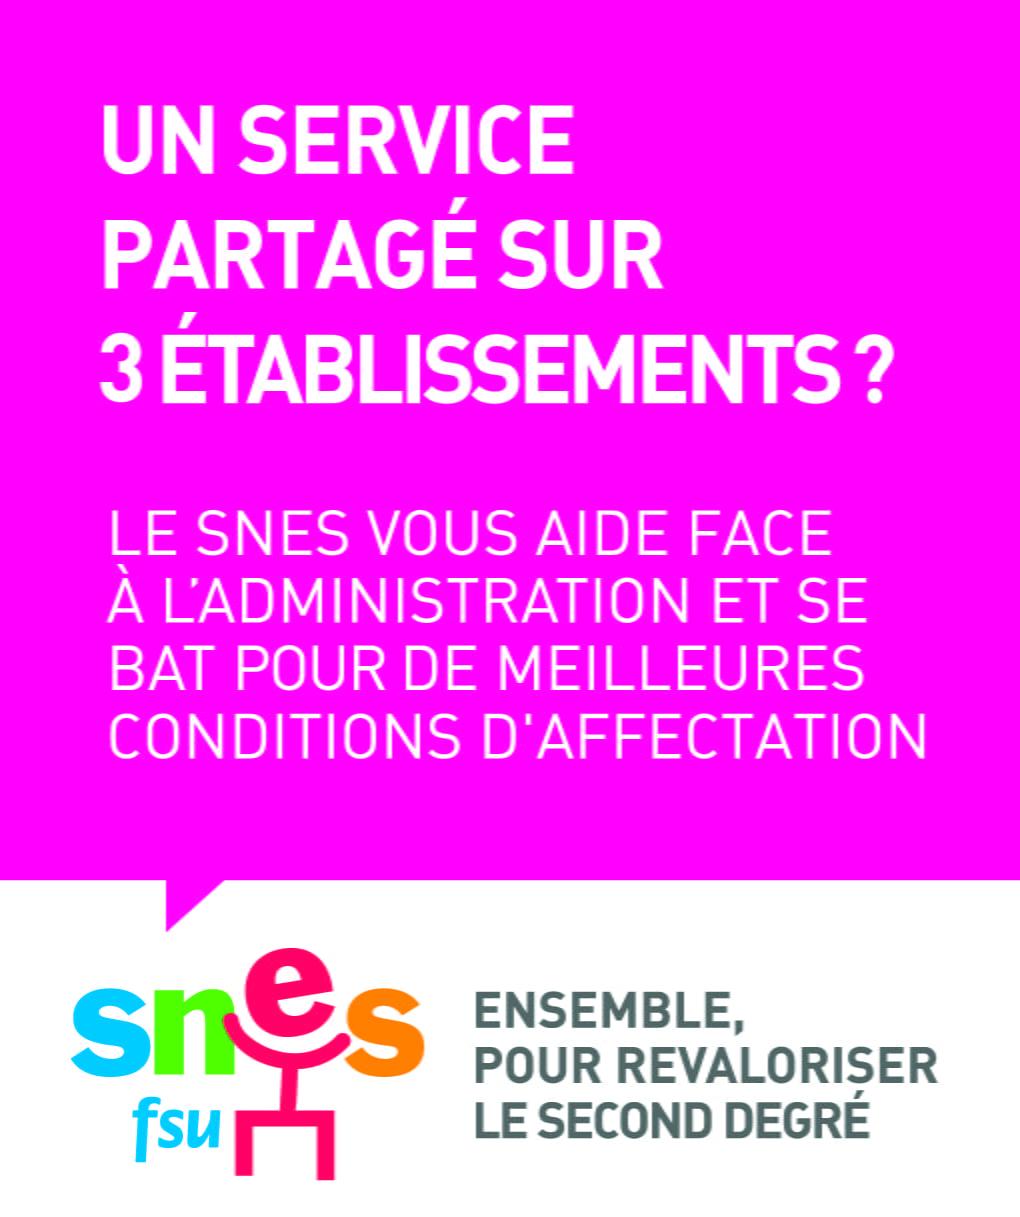 Service sur 3 établissements - Cadre - Format JPG - 575 ko